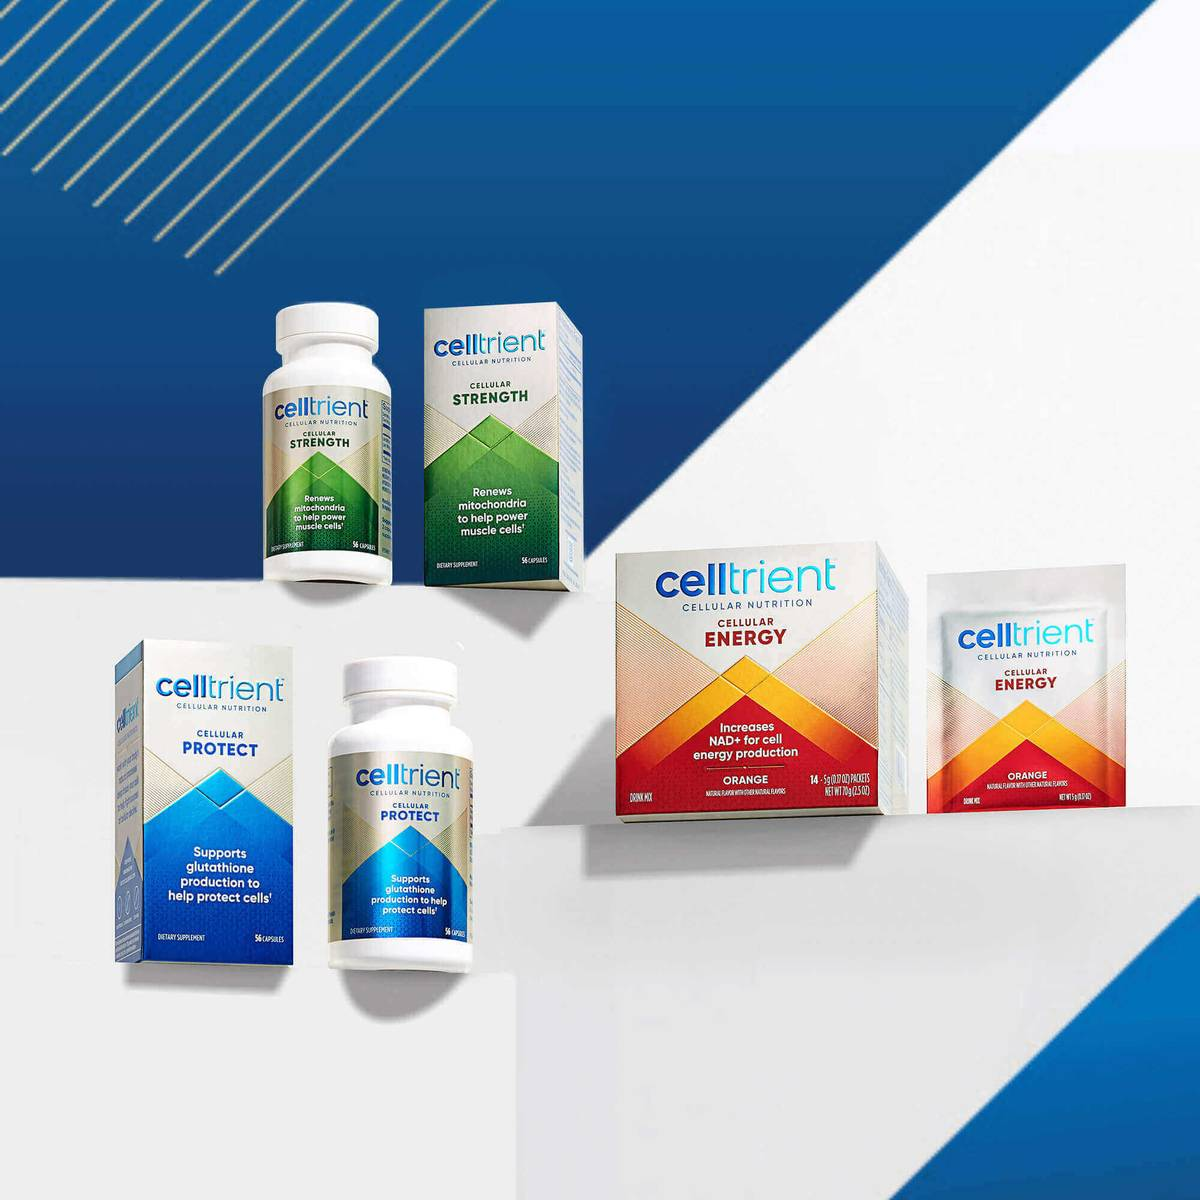 Image of Cellular Strength Urolithin A Supplement, Cellular Energy NAD+ Supplement and Cellular Protect Glutathione Supplement